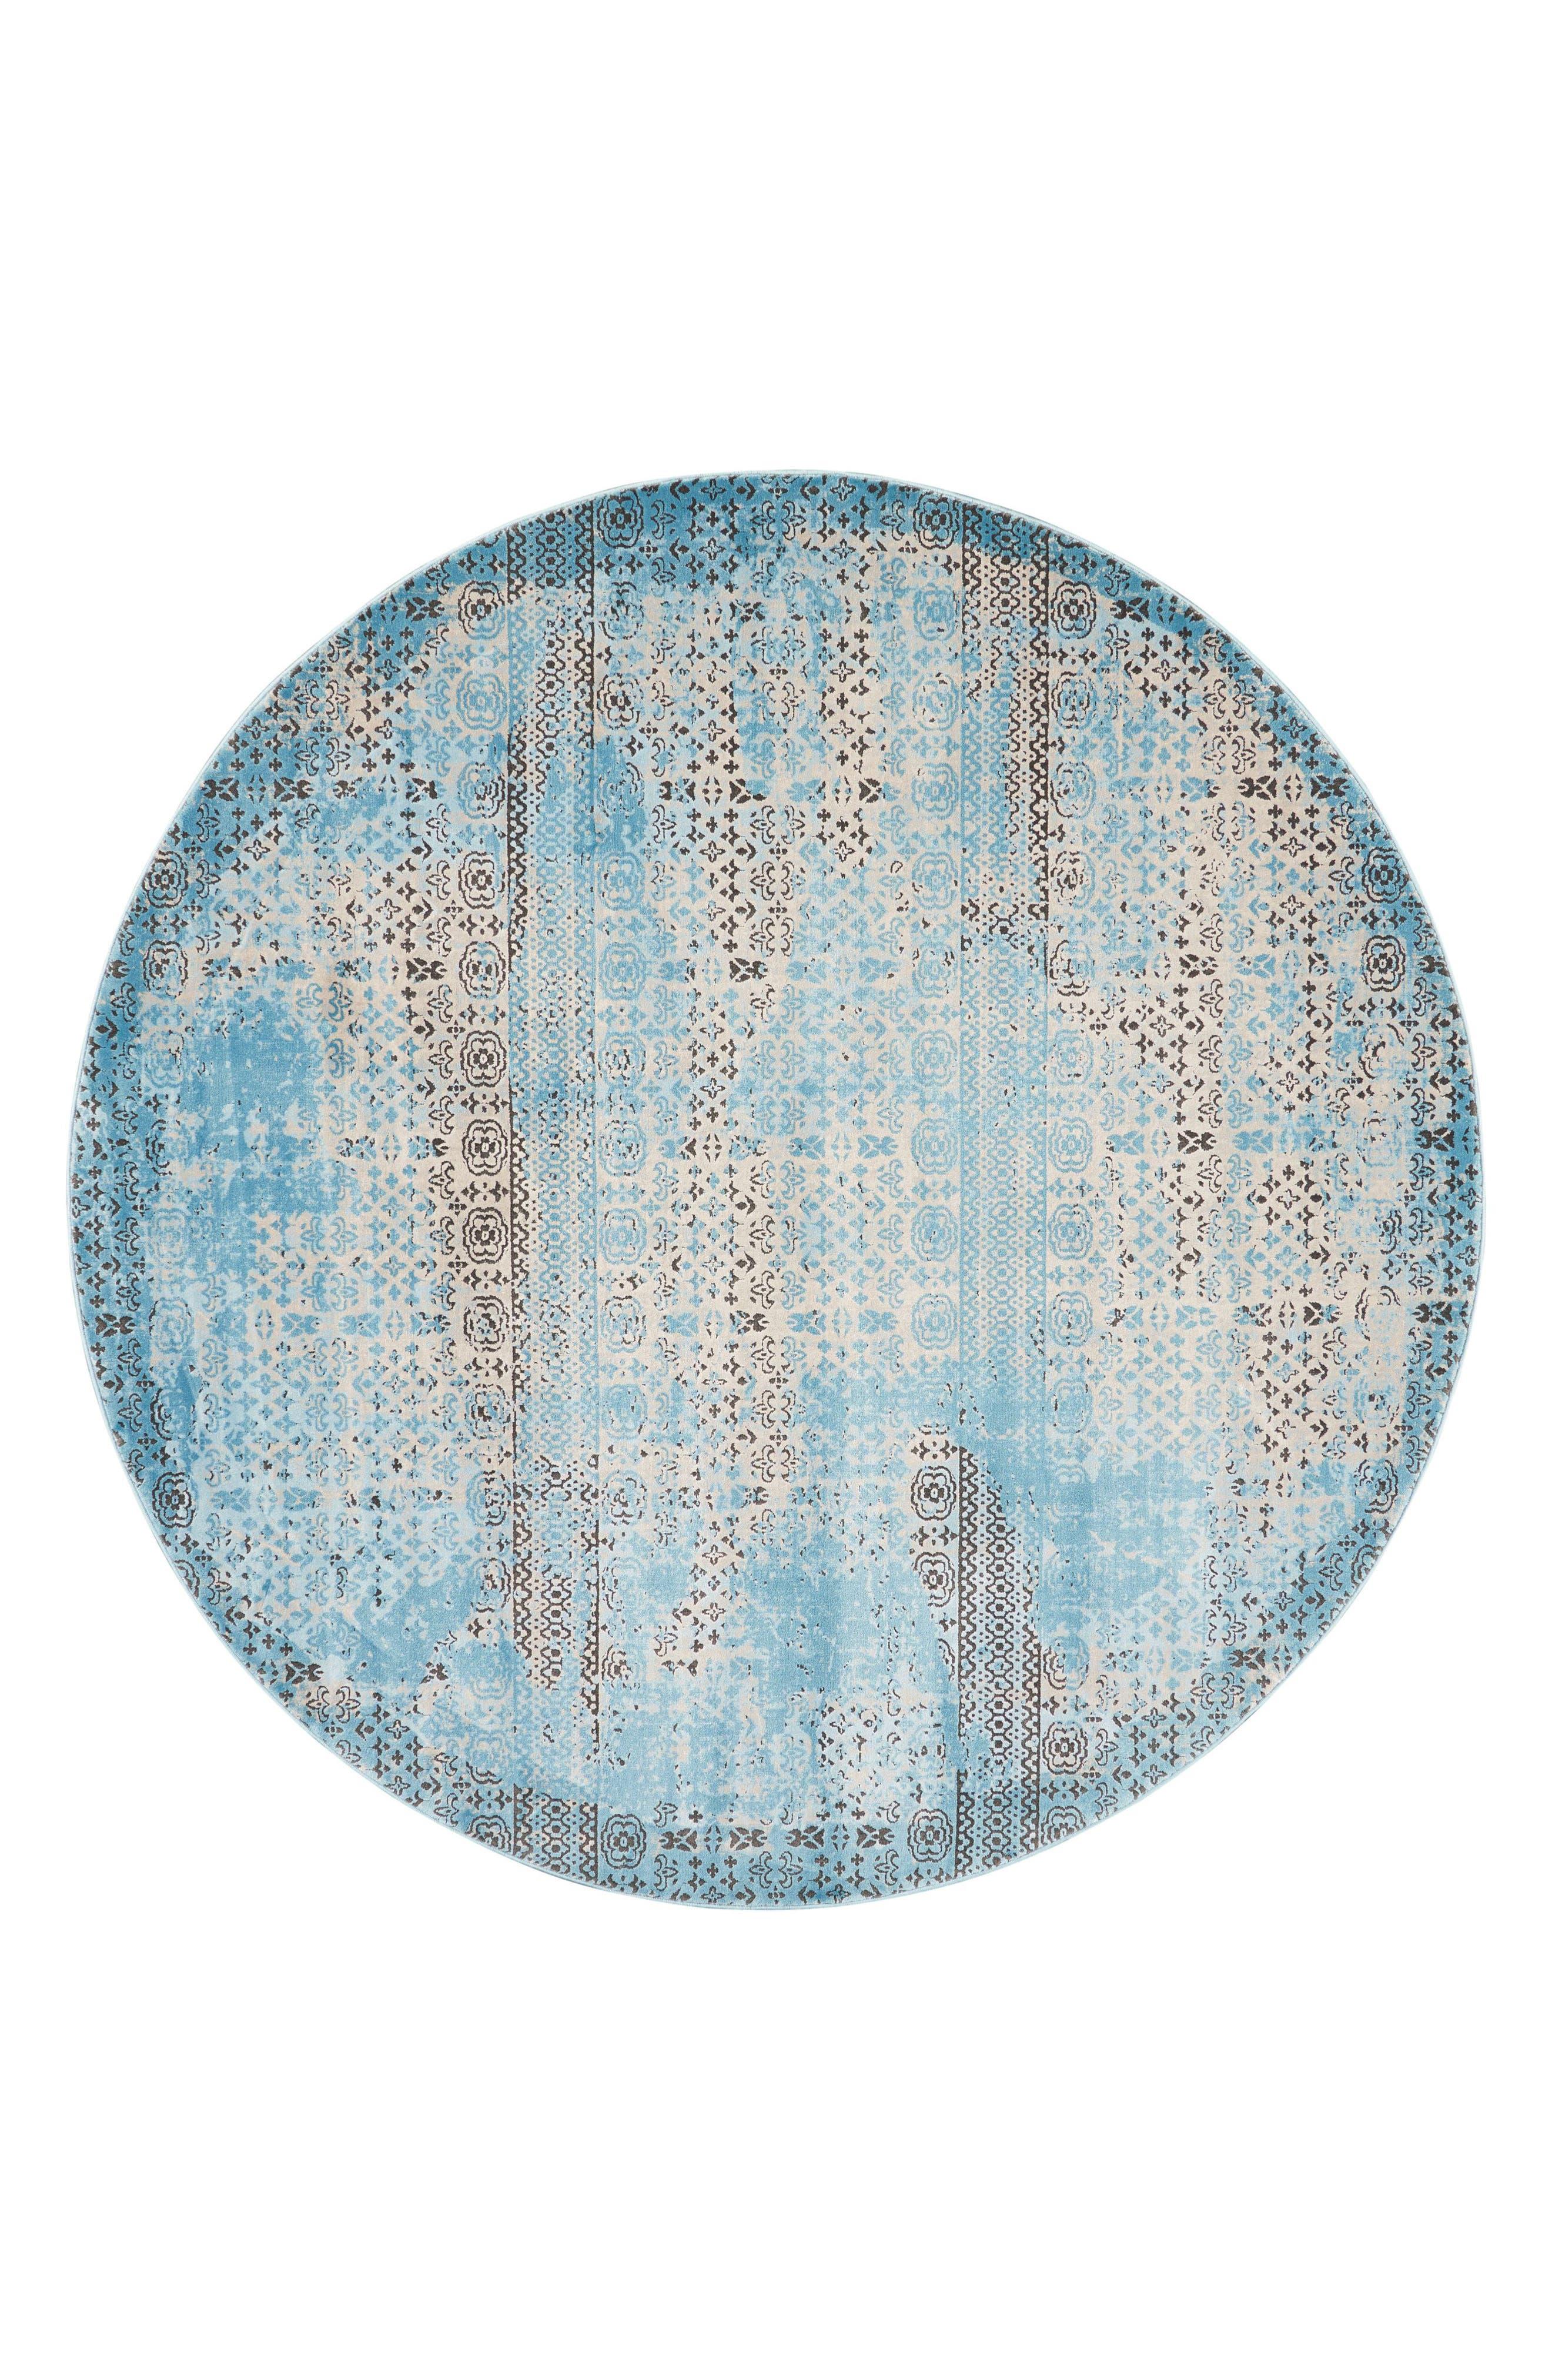 Karma Round Area Rug,                         Main,                         color, Blue